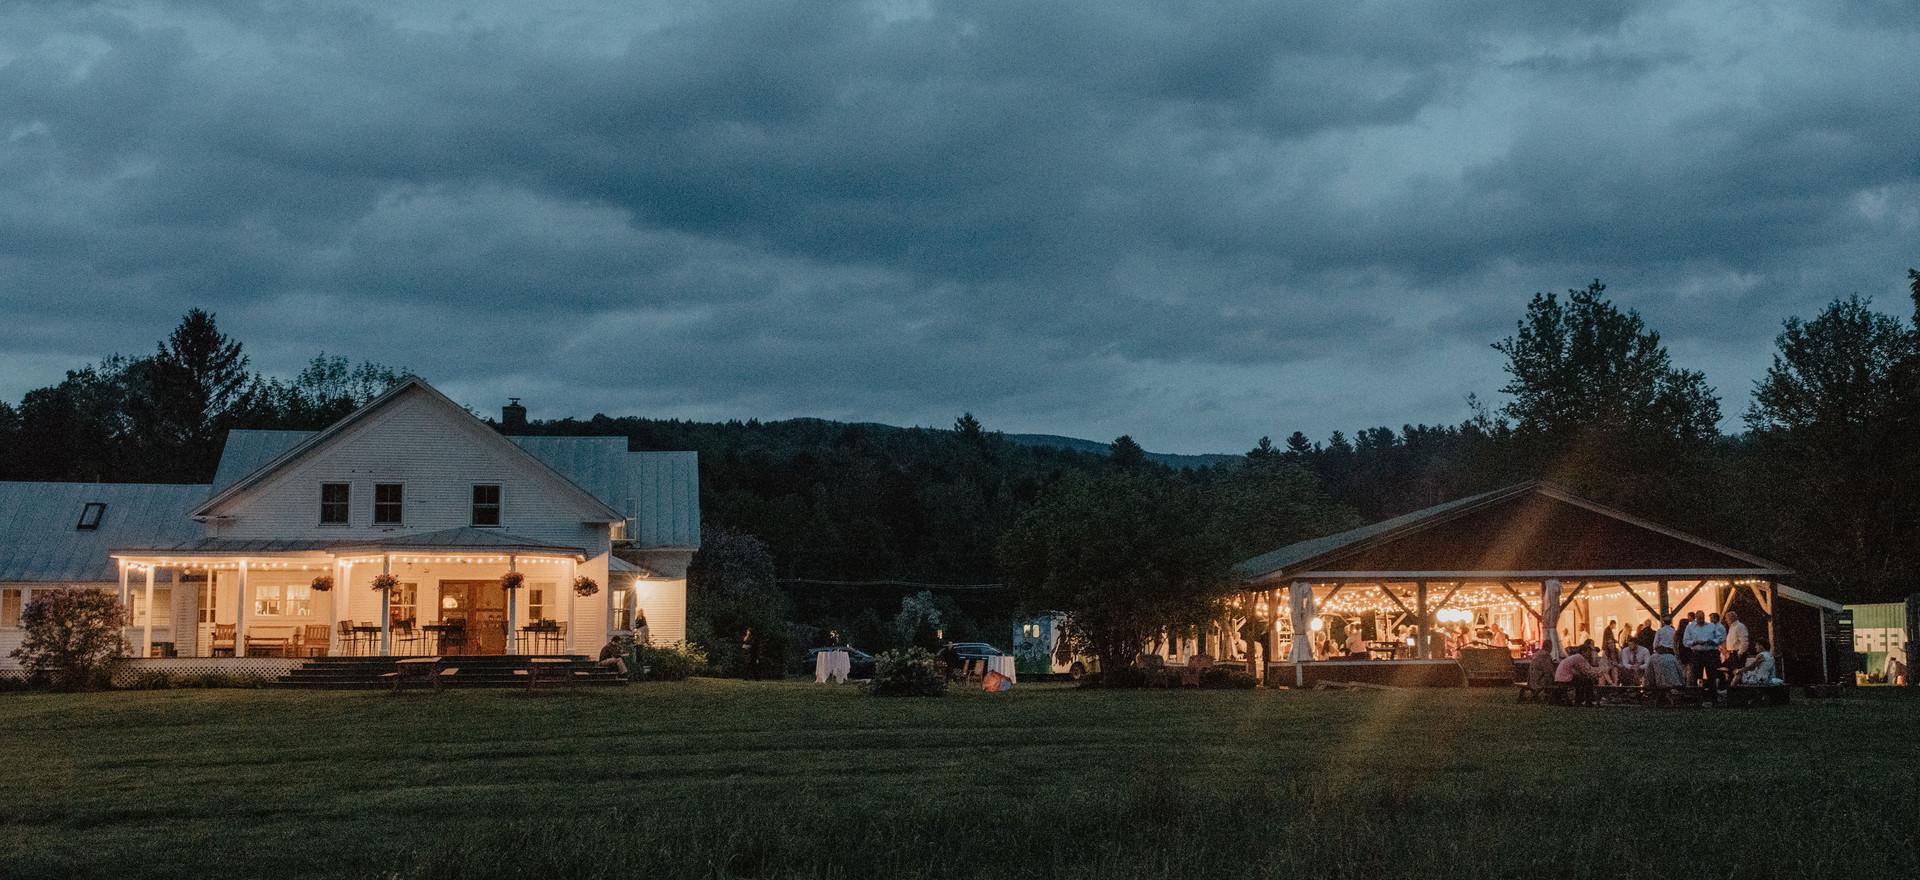 leigha-maclean-2019-06-spring-vermont-fa